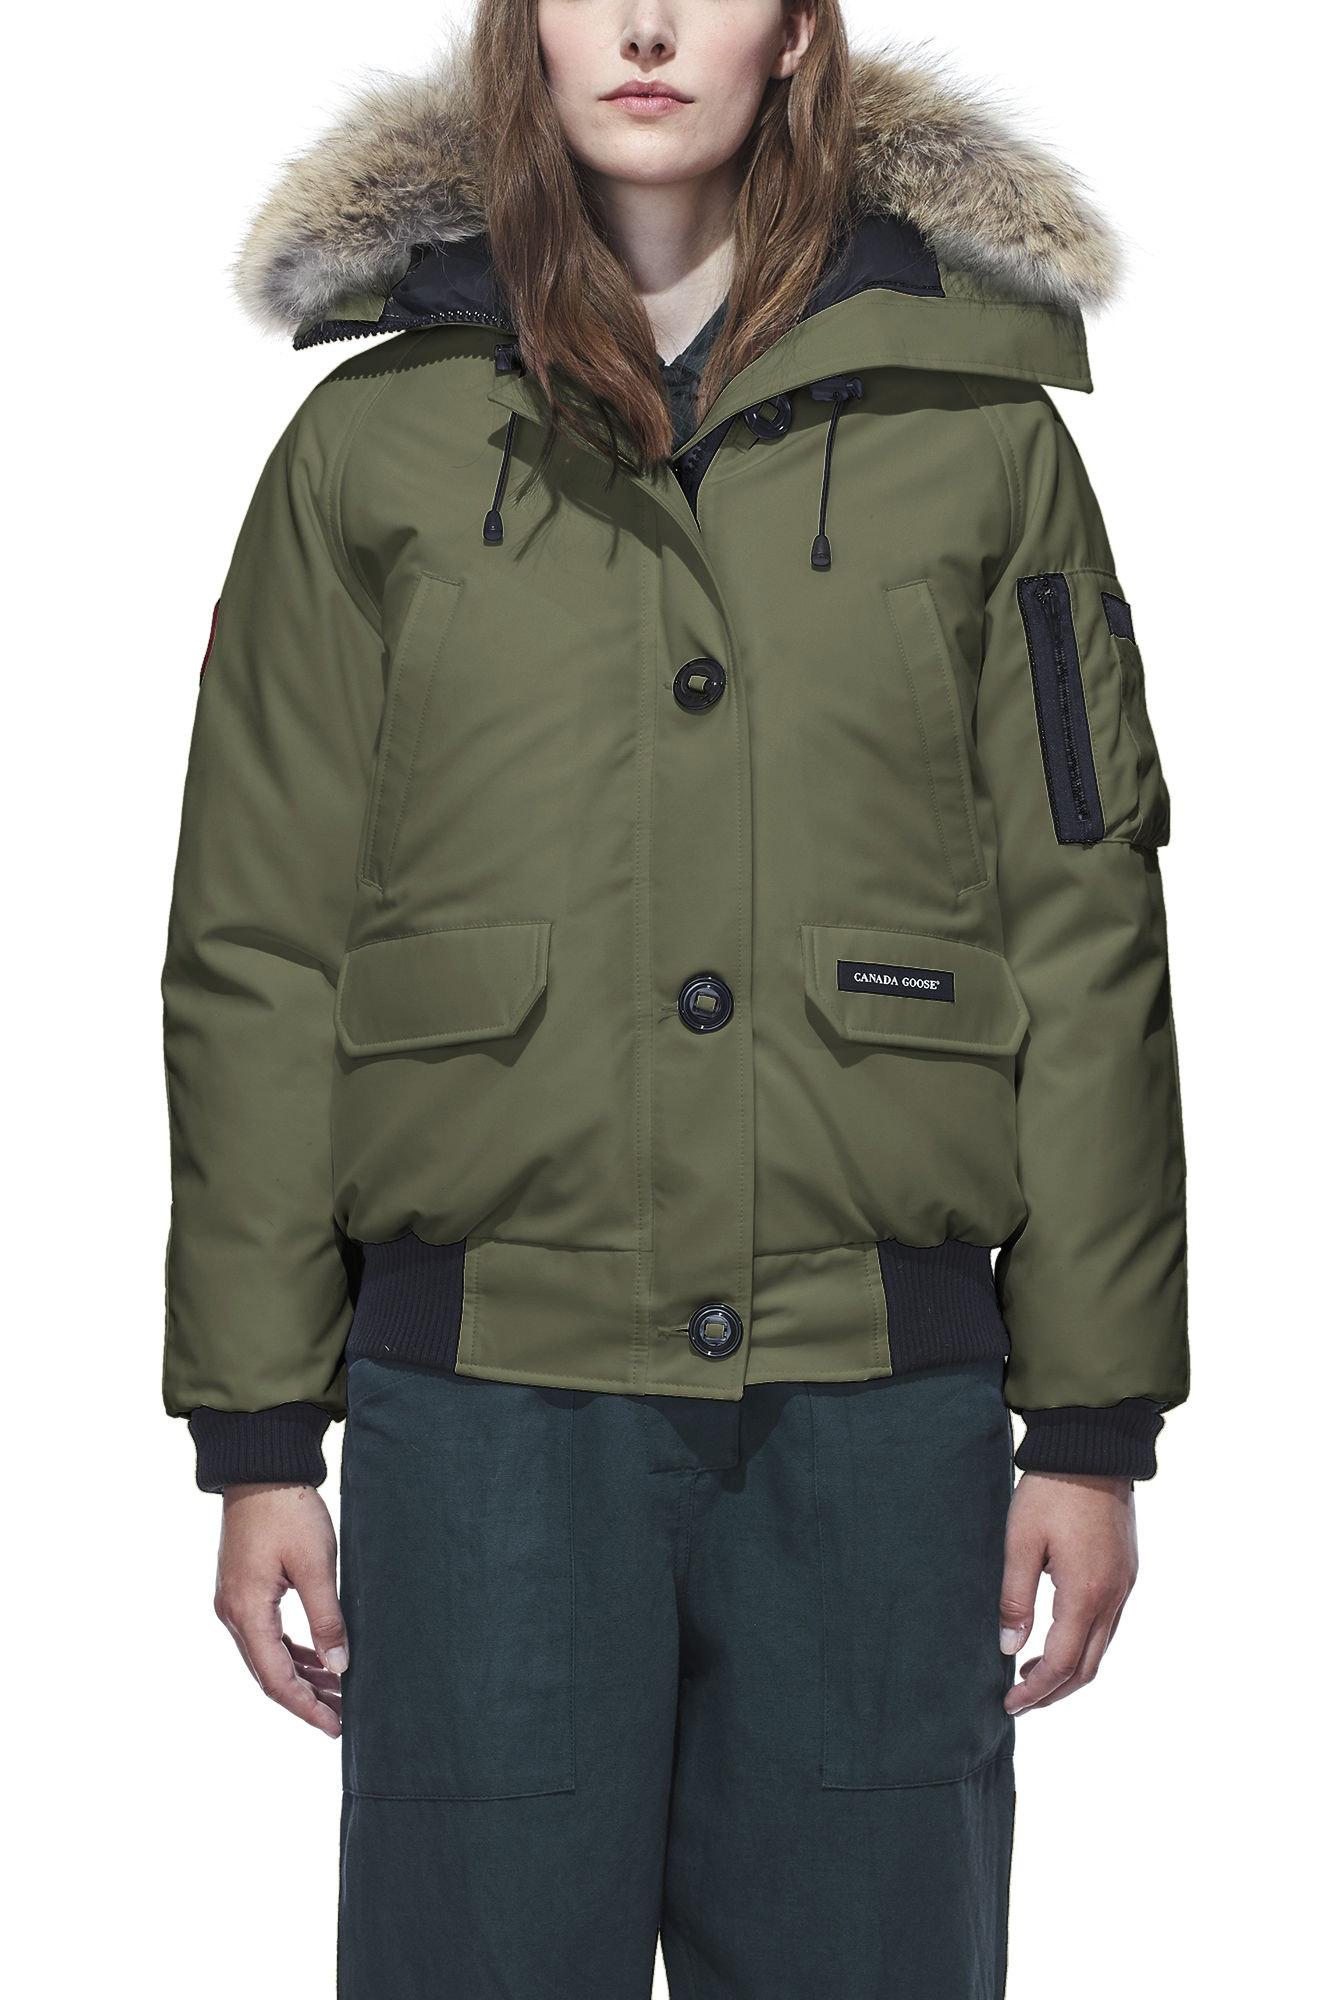 canada goose jacket macy's